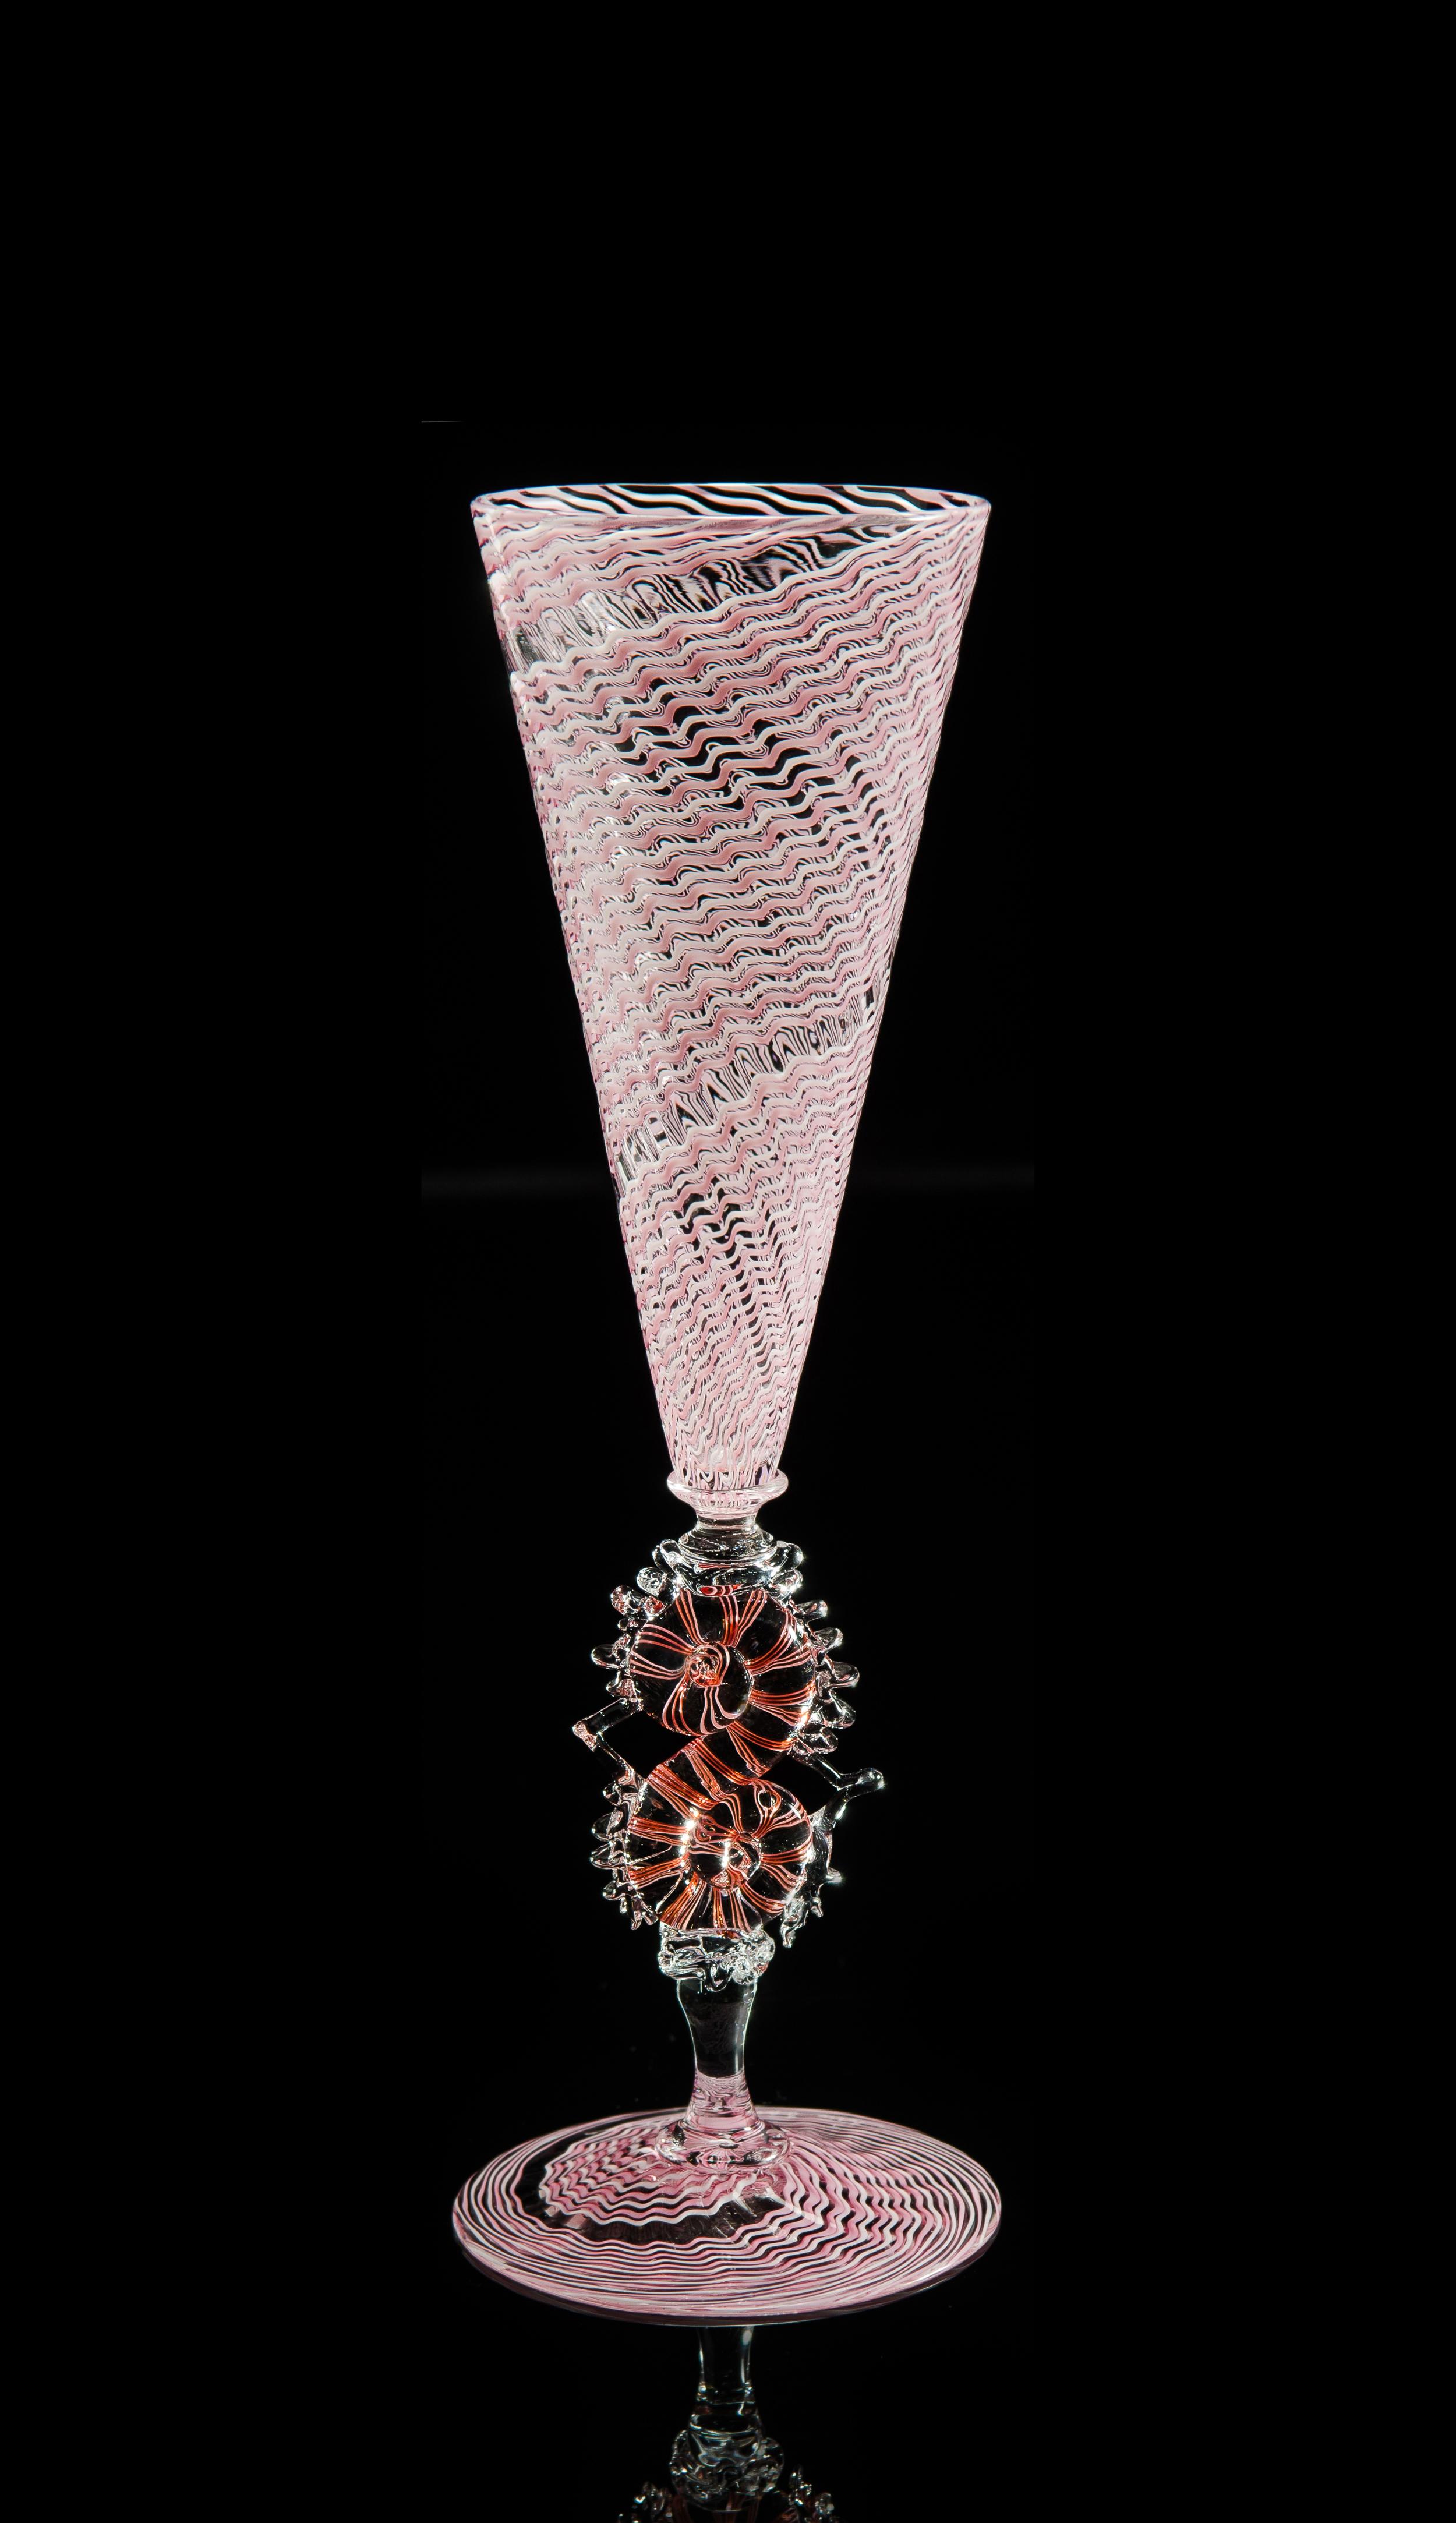 Lino Tagliapietra, Goblet (1991-1994, glass, 7 3/4 x 3 3/4 x 3 3/4 inches), LT.66